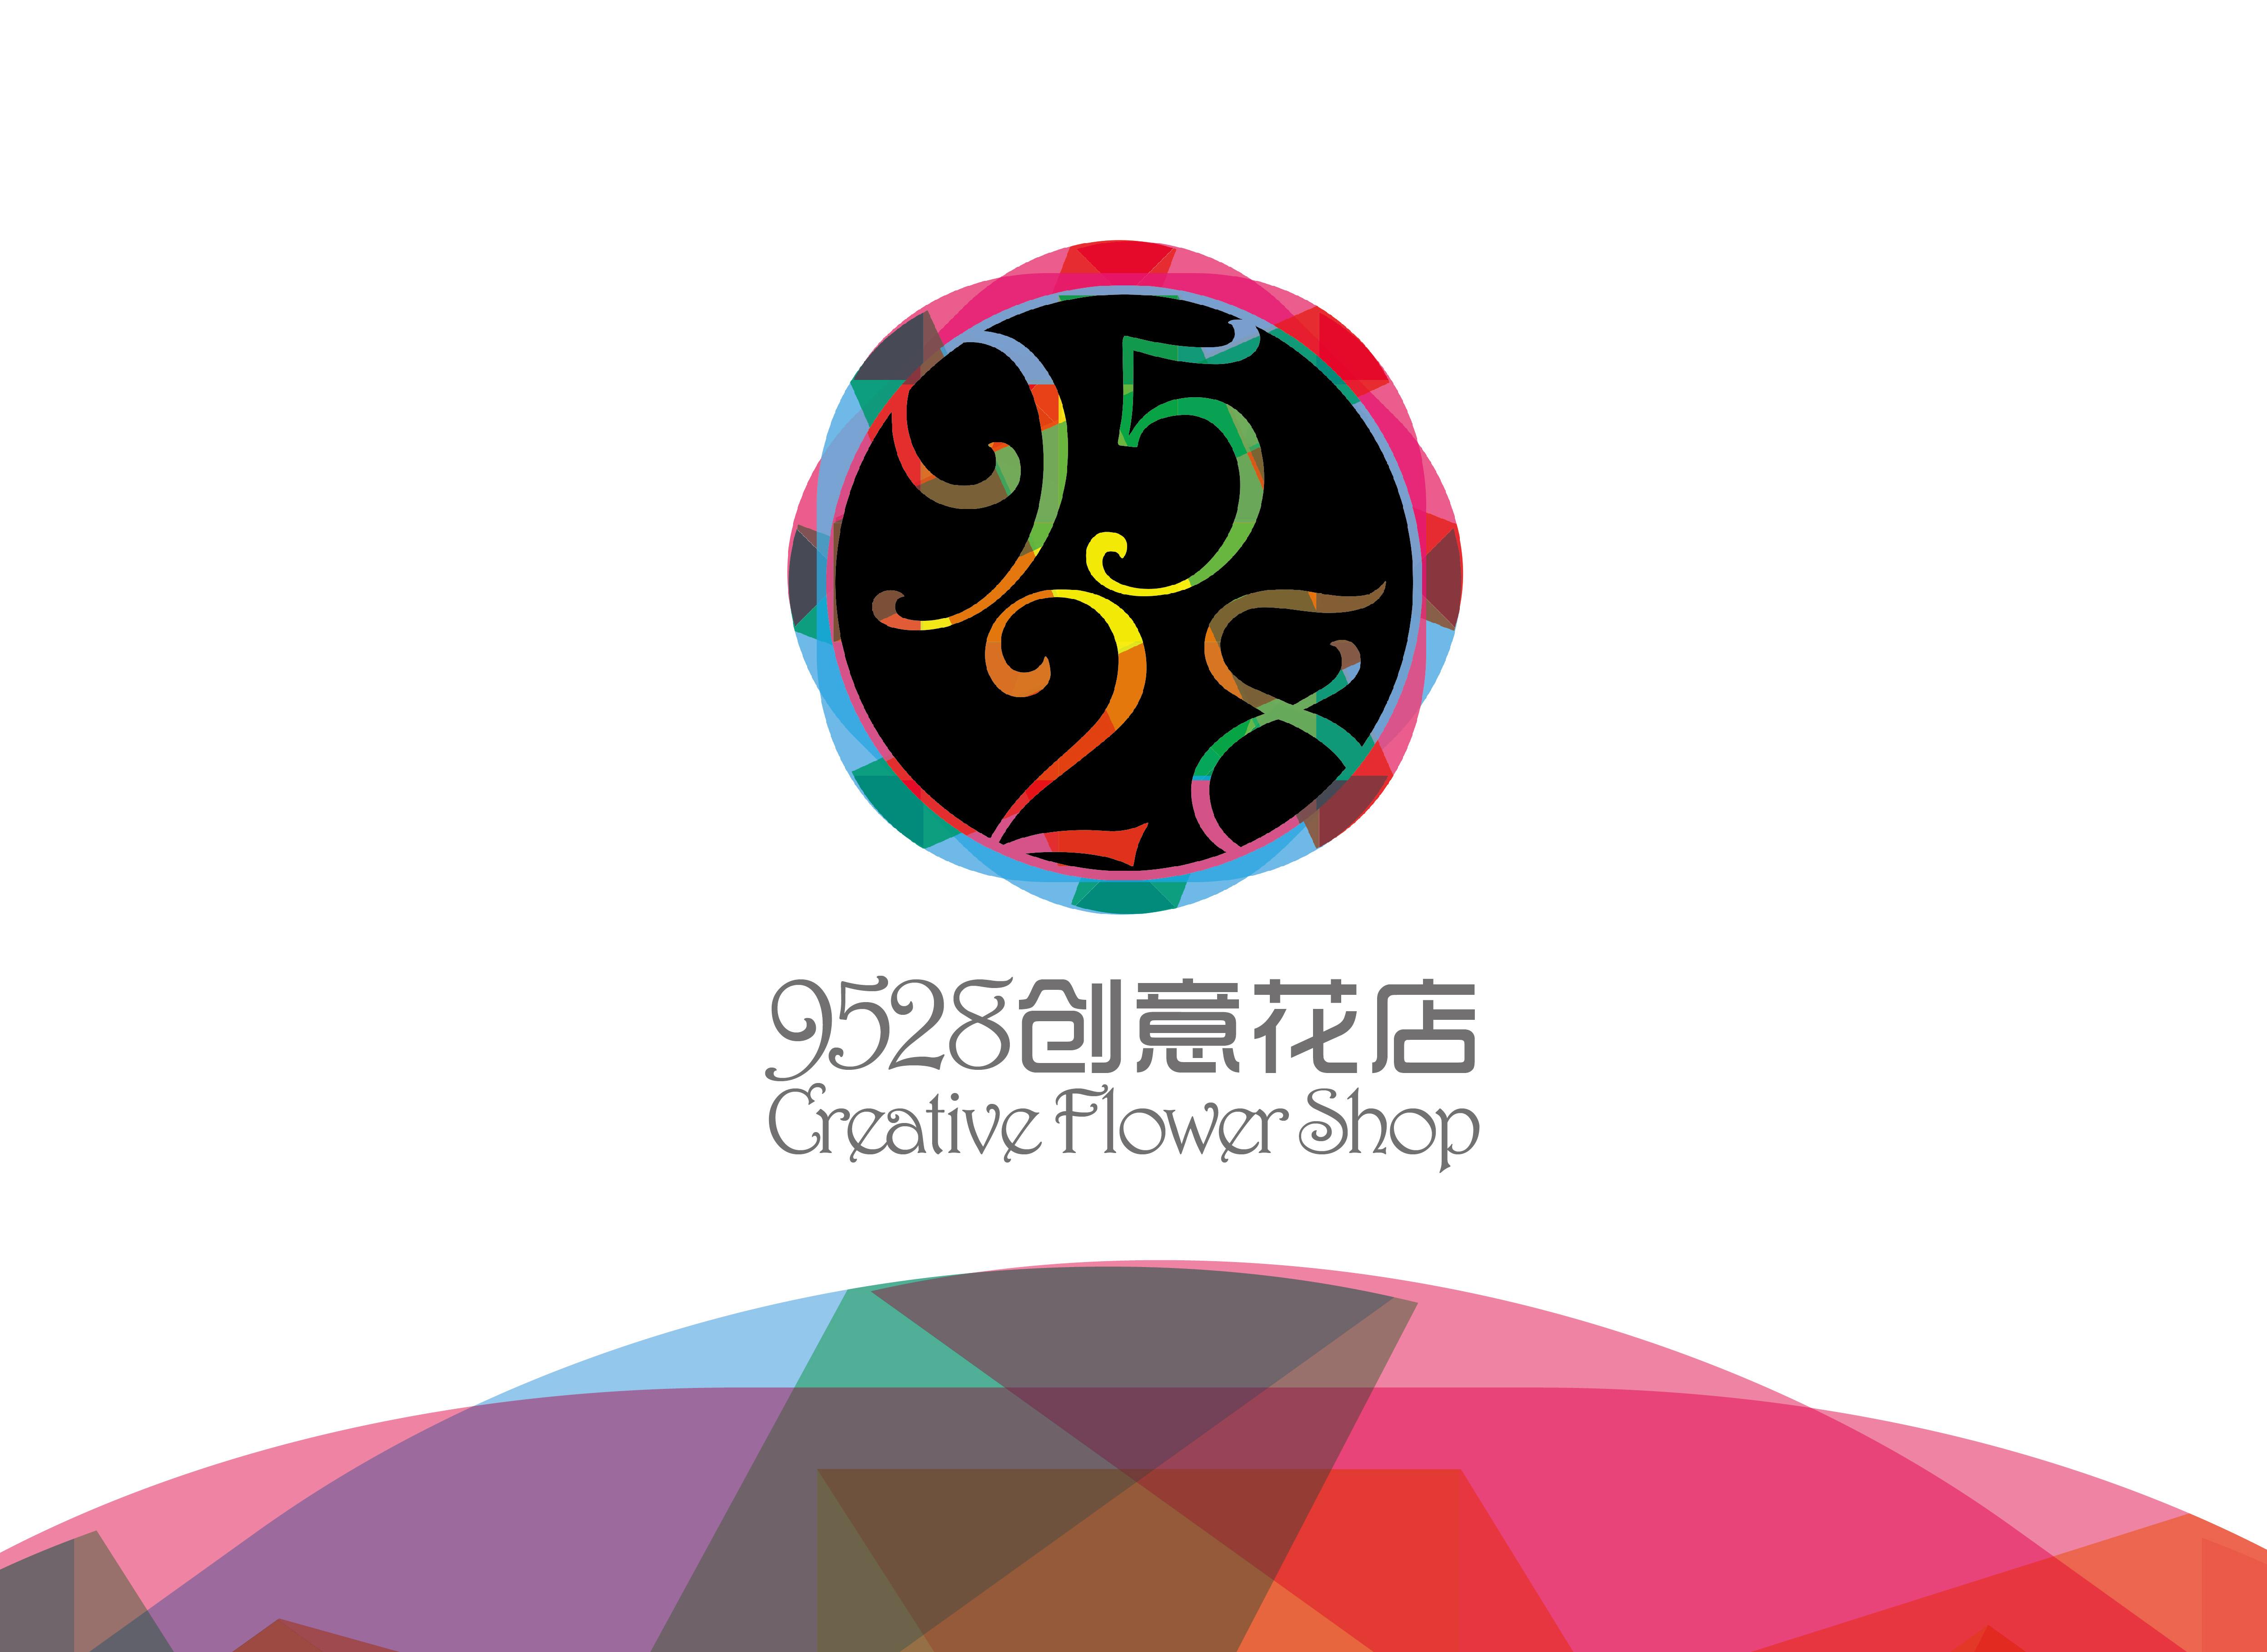 logo设计-枫设计工作室(maple studio)作品|平面|标志图片